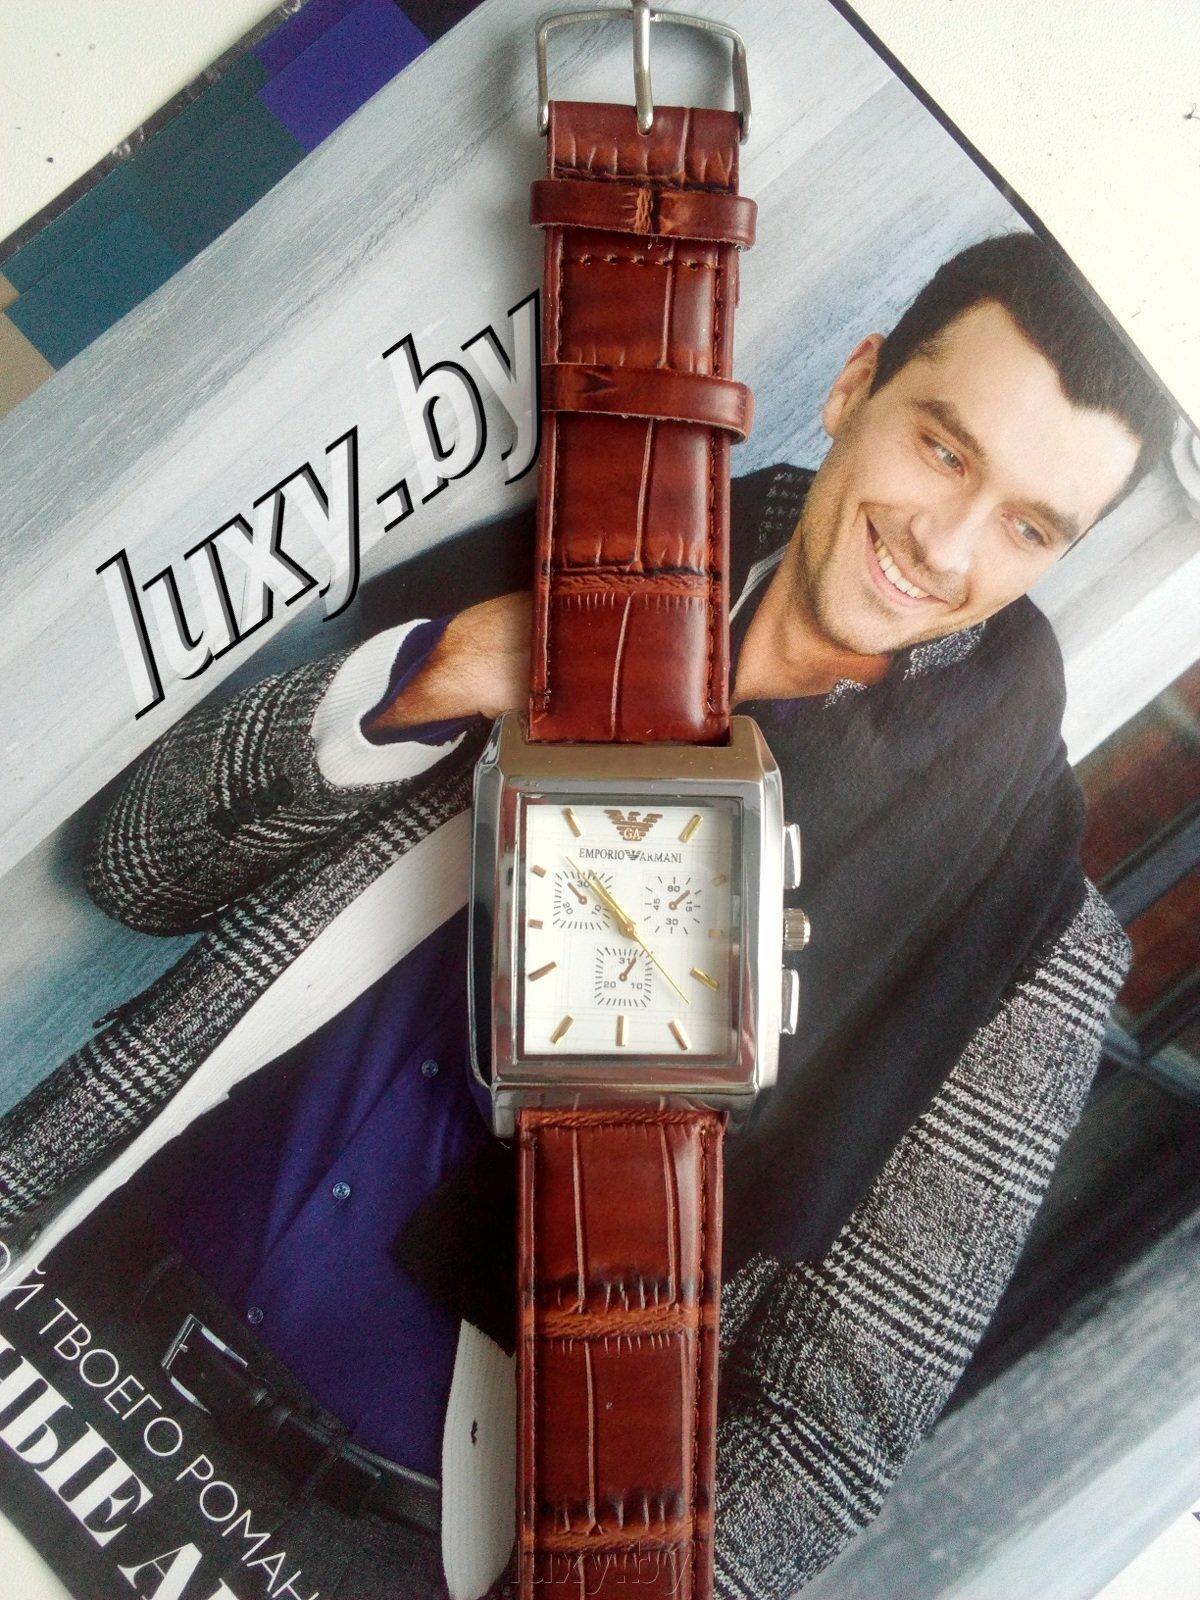 Часы наручные мужские Emporia armani, ремешок коричневый, арт.Н-19 - фото pic_f62f8b00ebf1374_1920x9000_1.jpg